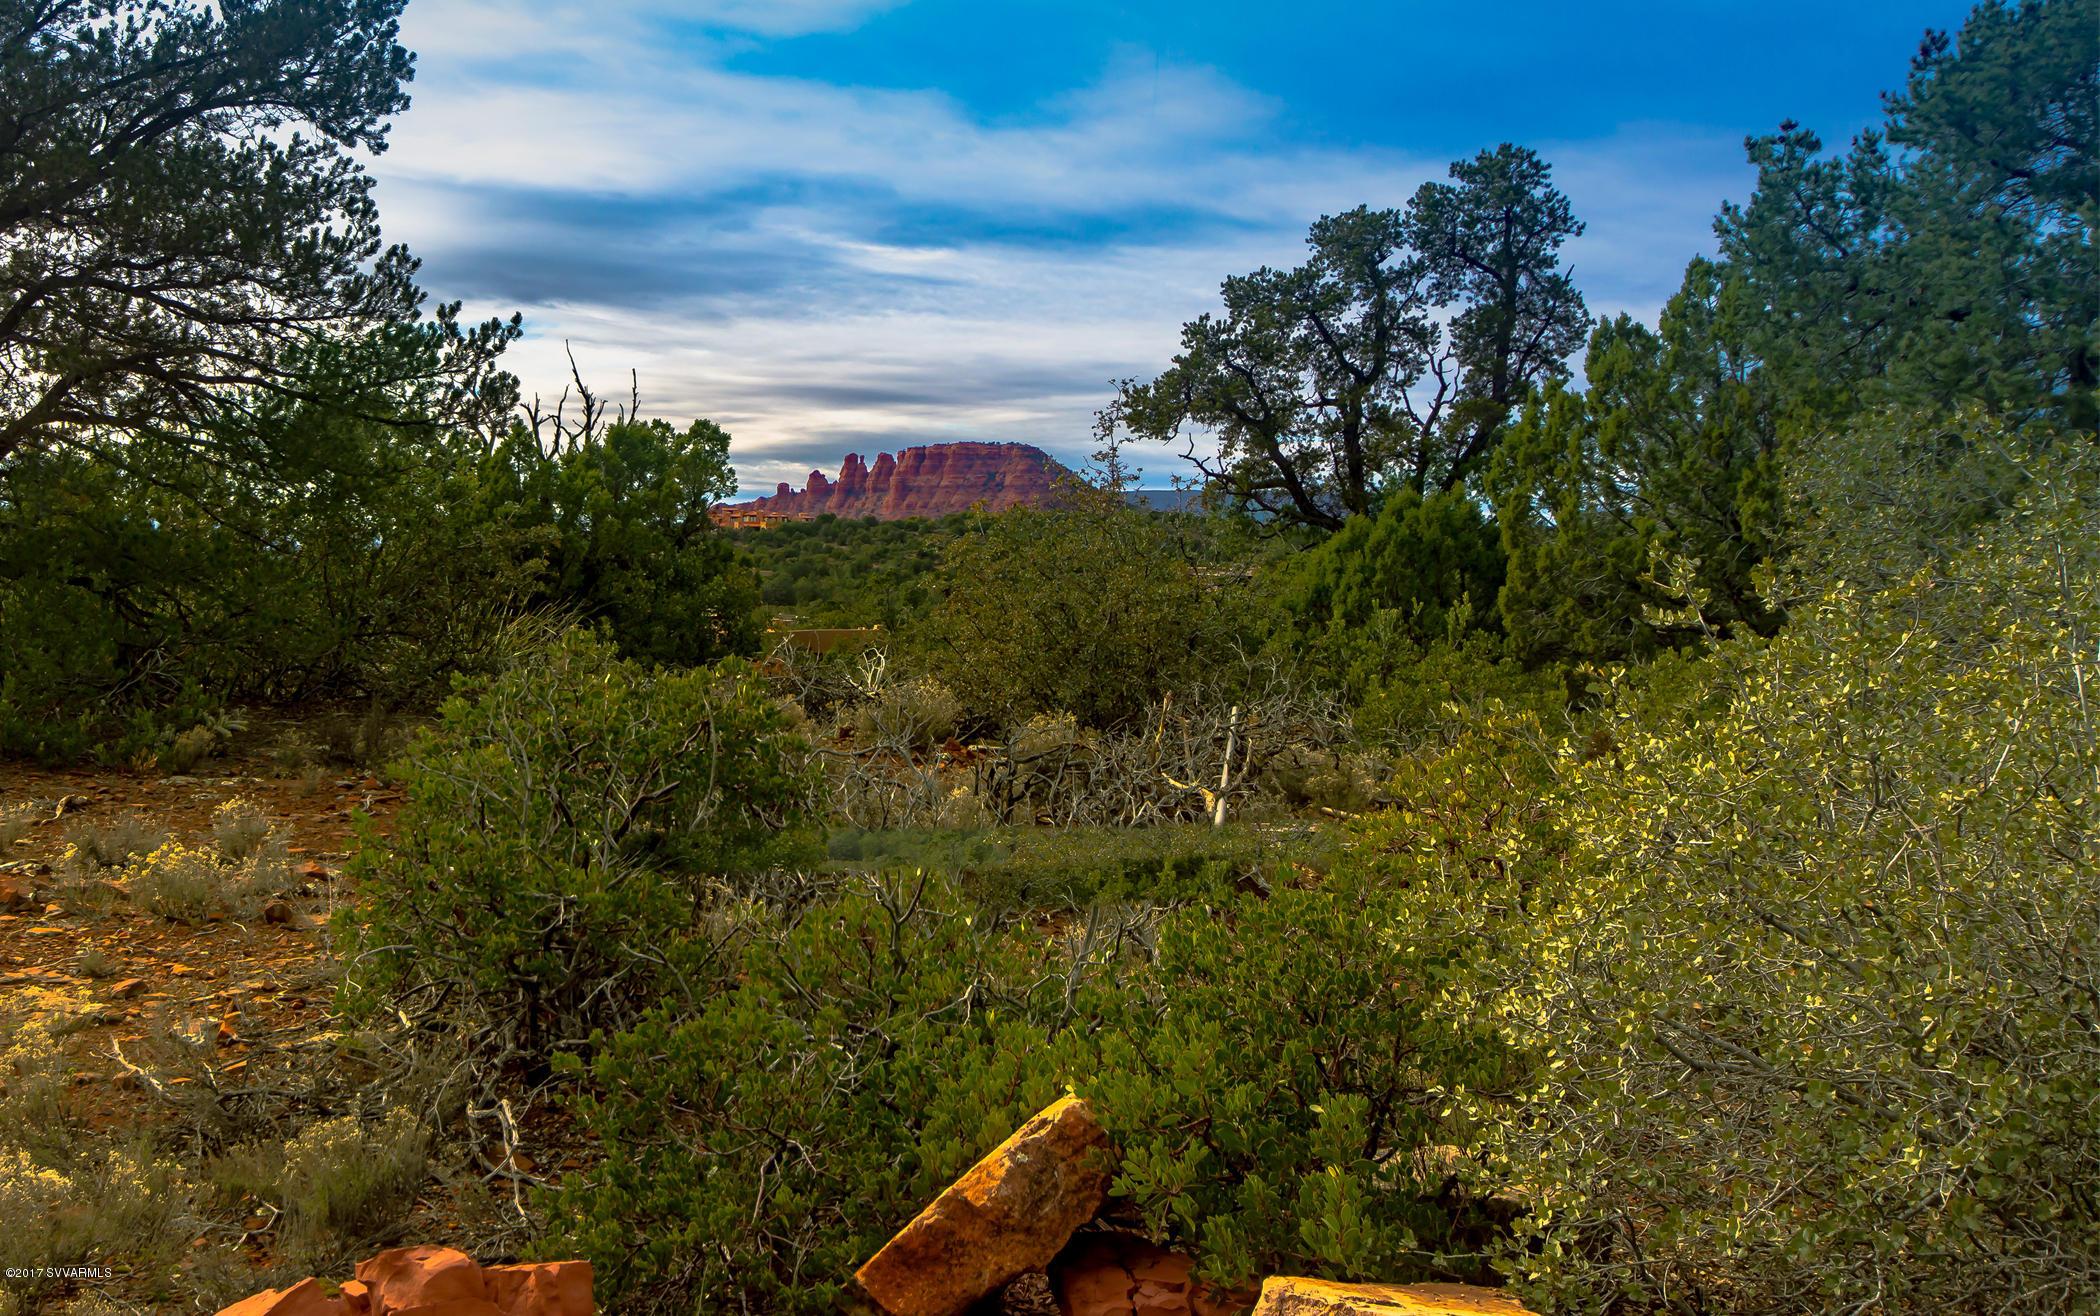 955 Dry Creek Rd Sedona, AZ 86336